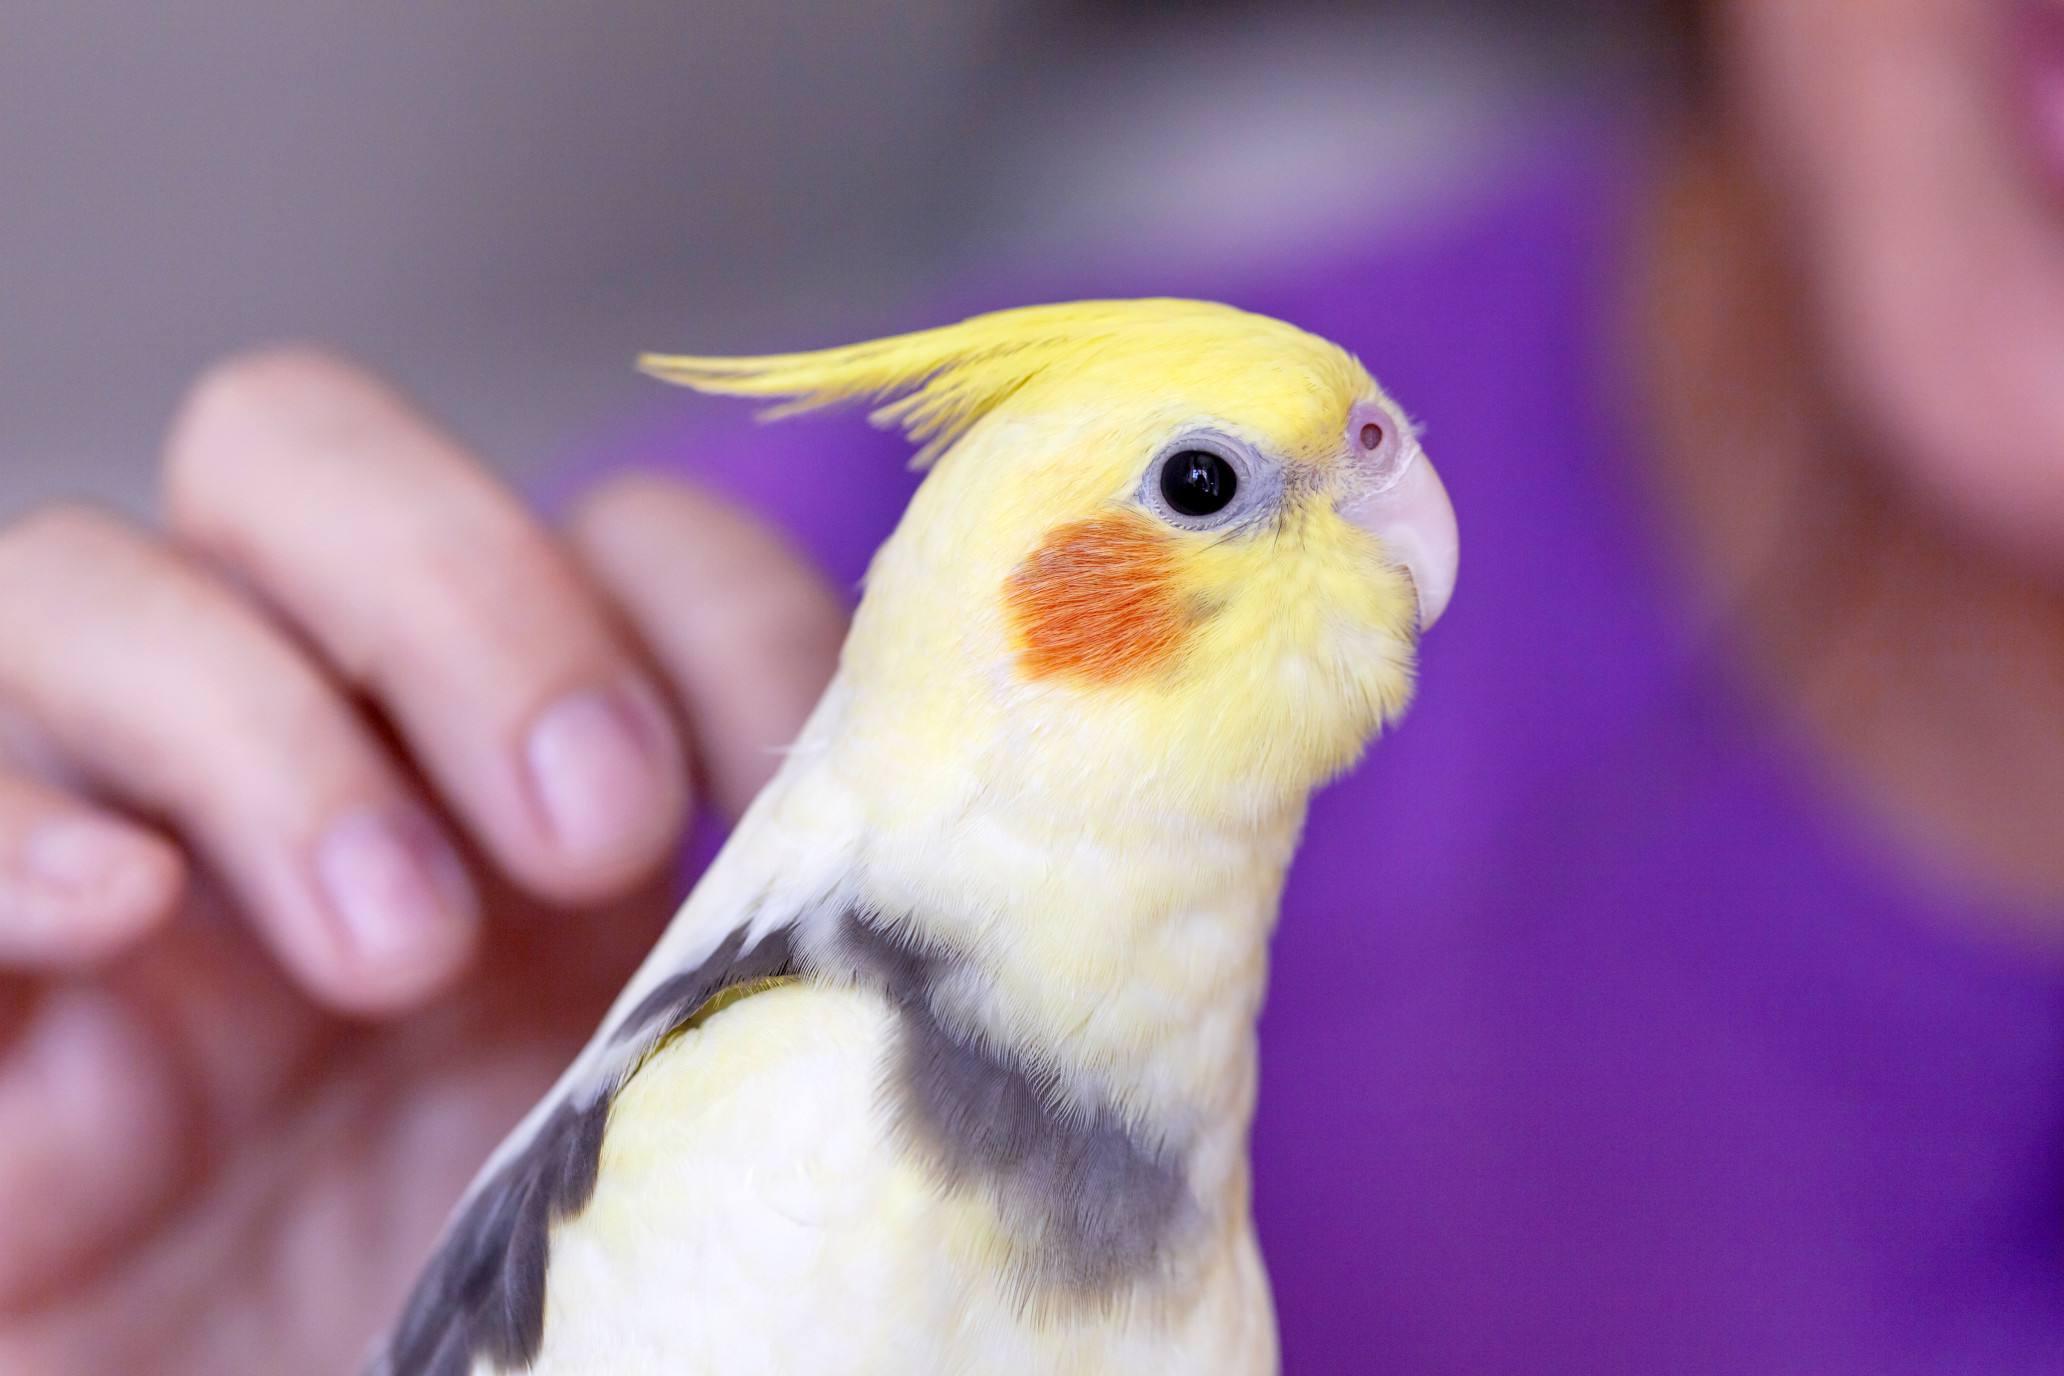 Petting parrot